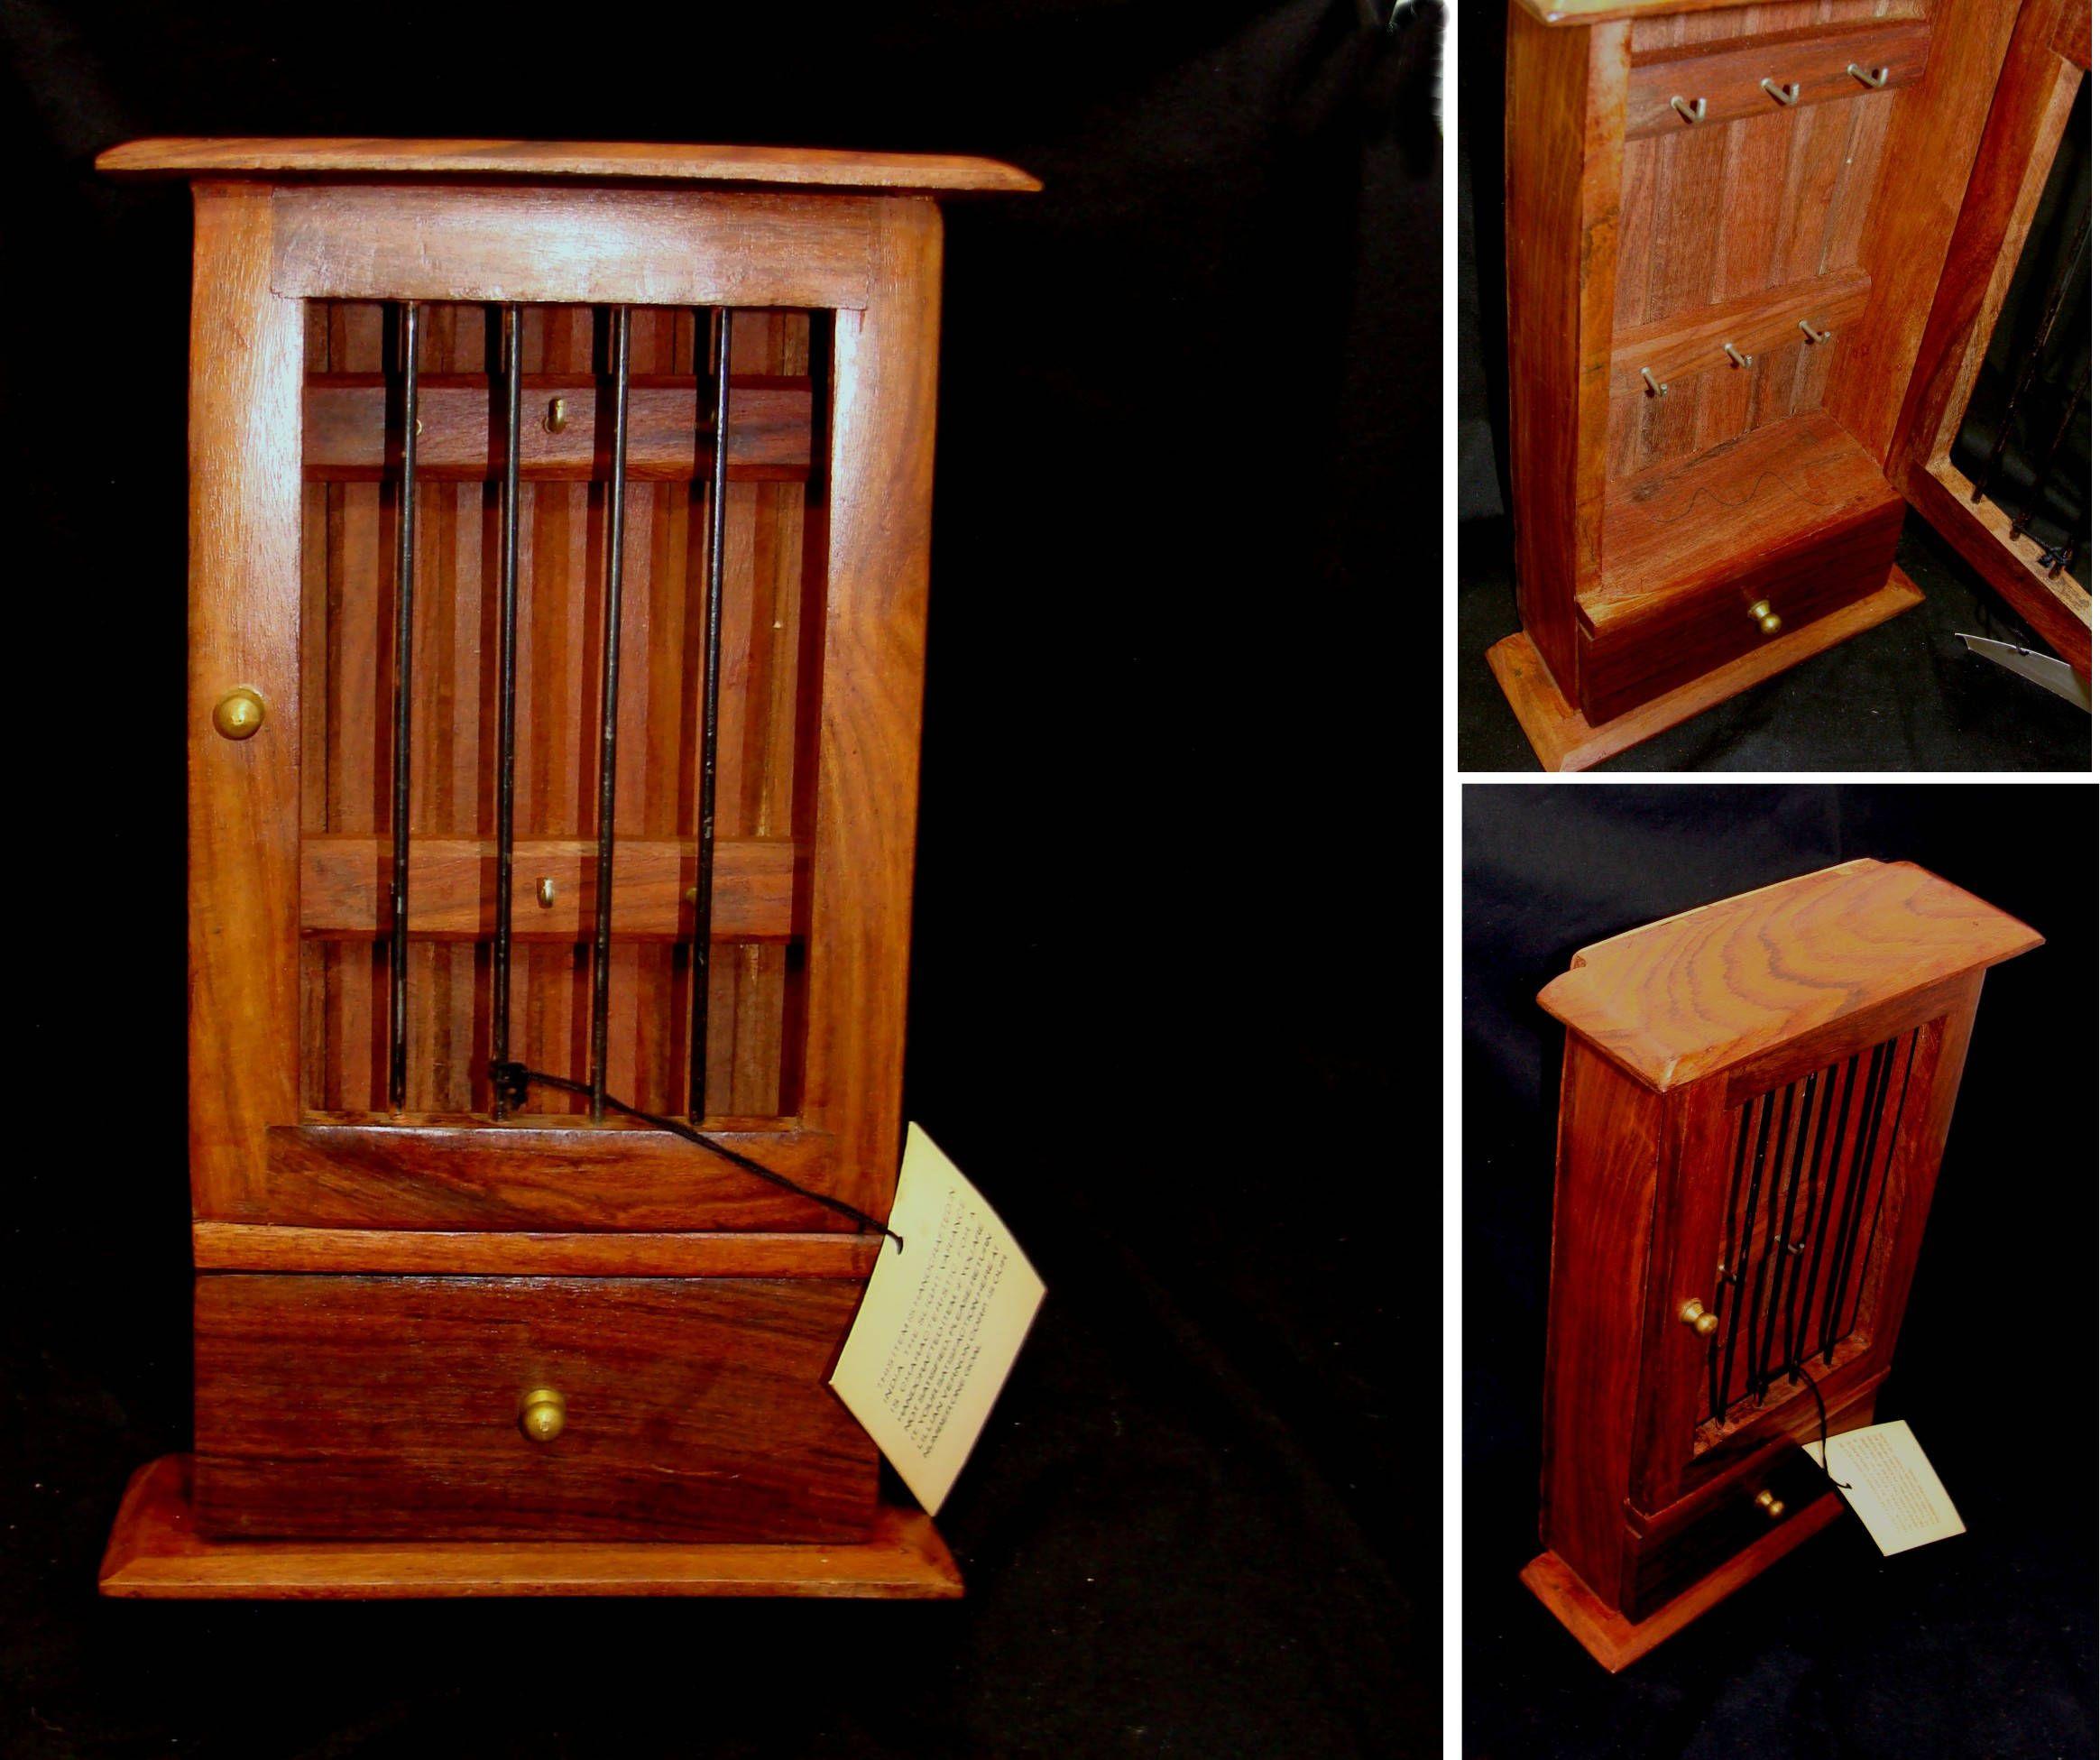 Vintage Wood Box Unique Jail Cell Box Wooden Key Holder Box Southwest Decor Vintage Southwestern Box Father Vintage Wood Box Vintage Wood Wooden Key Holder